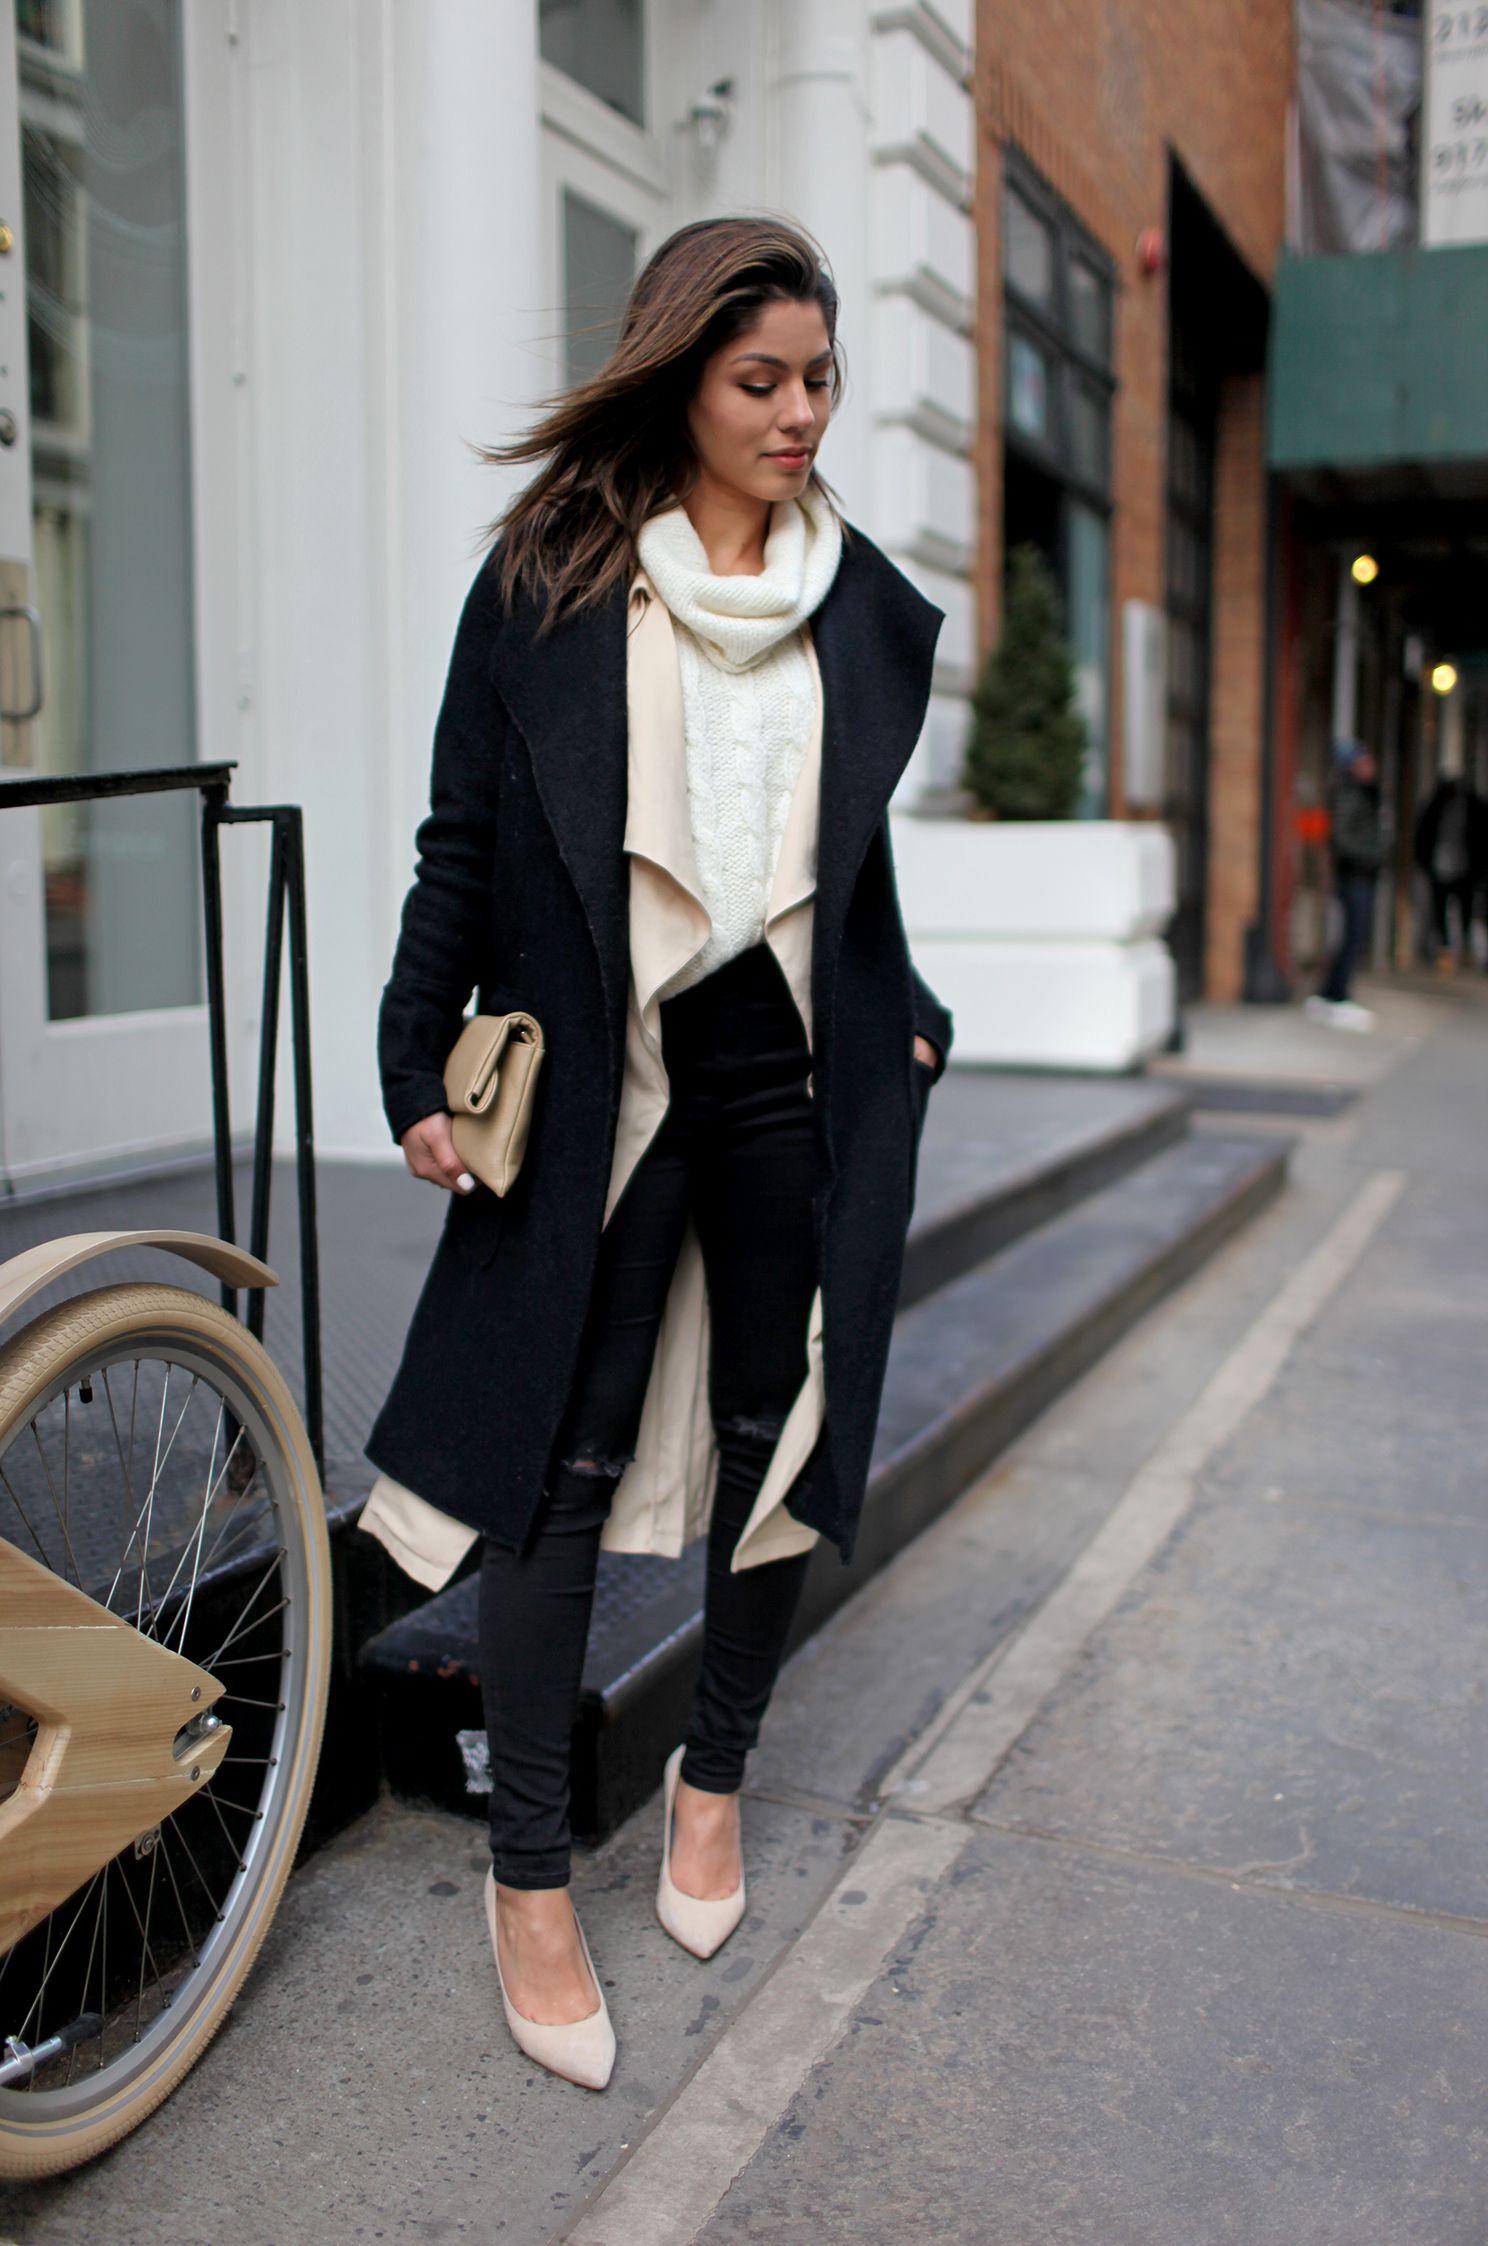 major layer | megan batoon | outfit inspo. | pinterest | layering